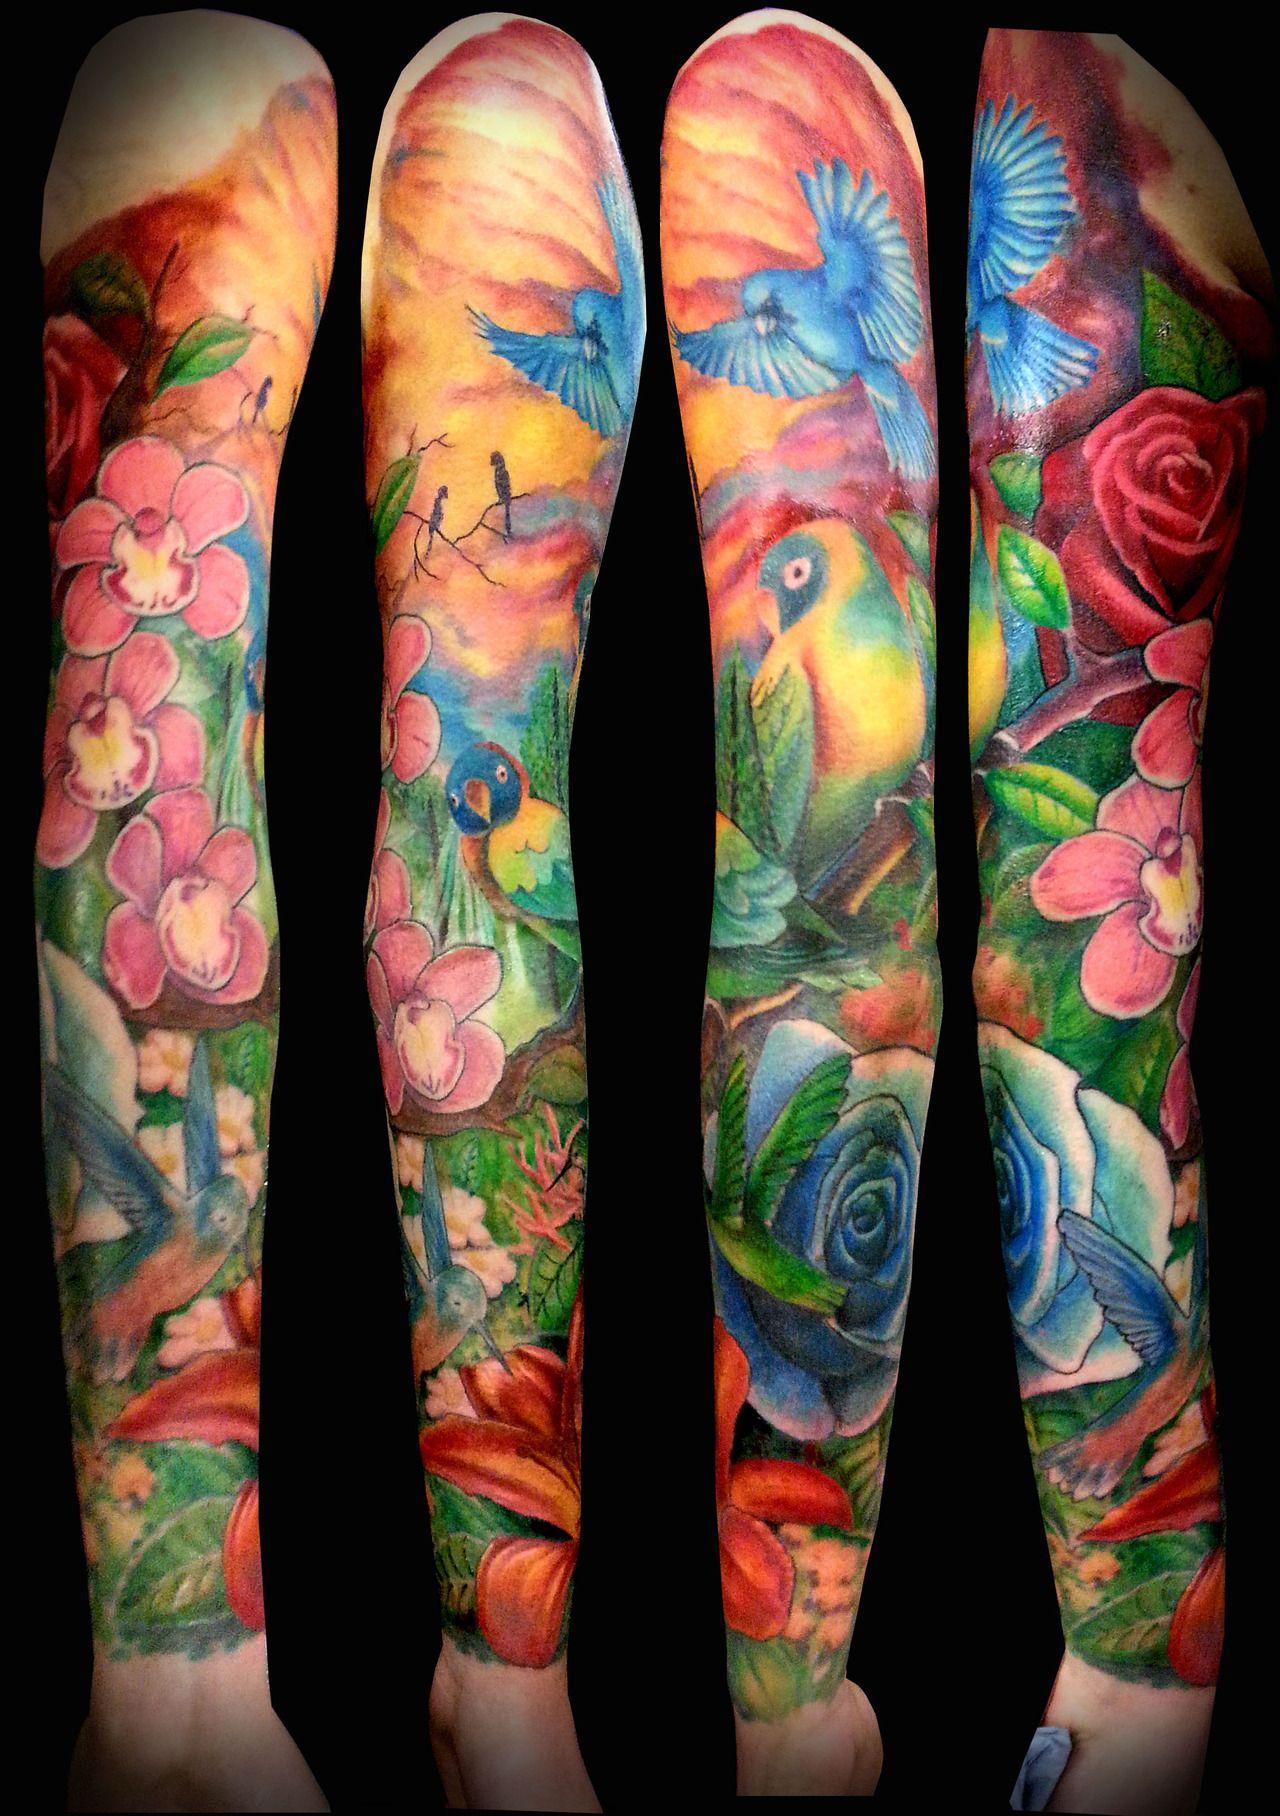 By Martin Ian Ink Tattoo Sleeve tattoos for women